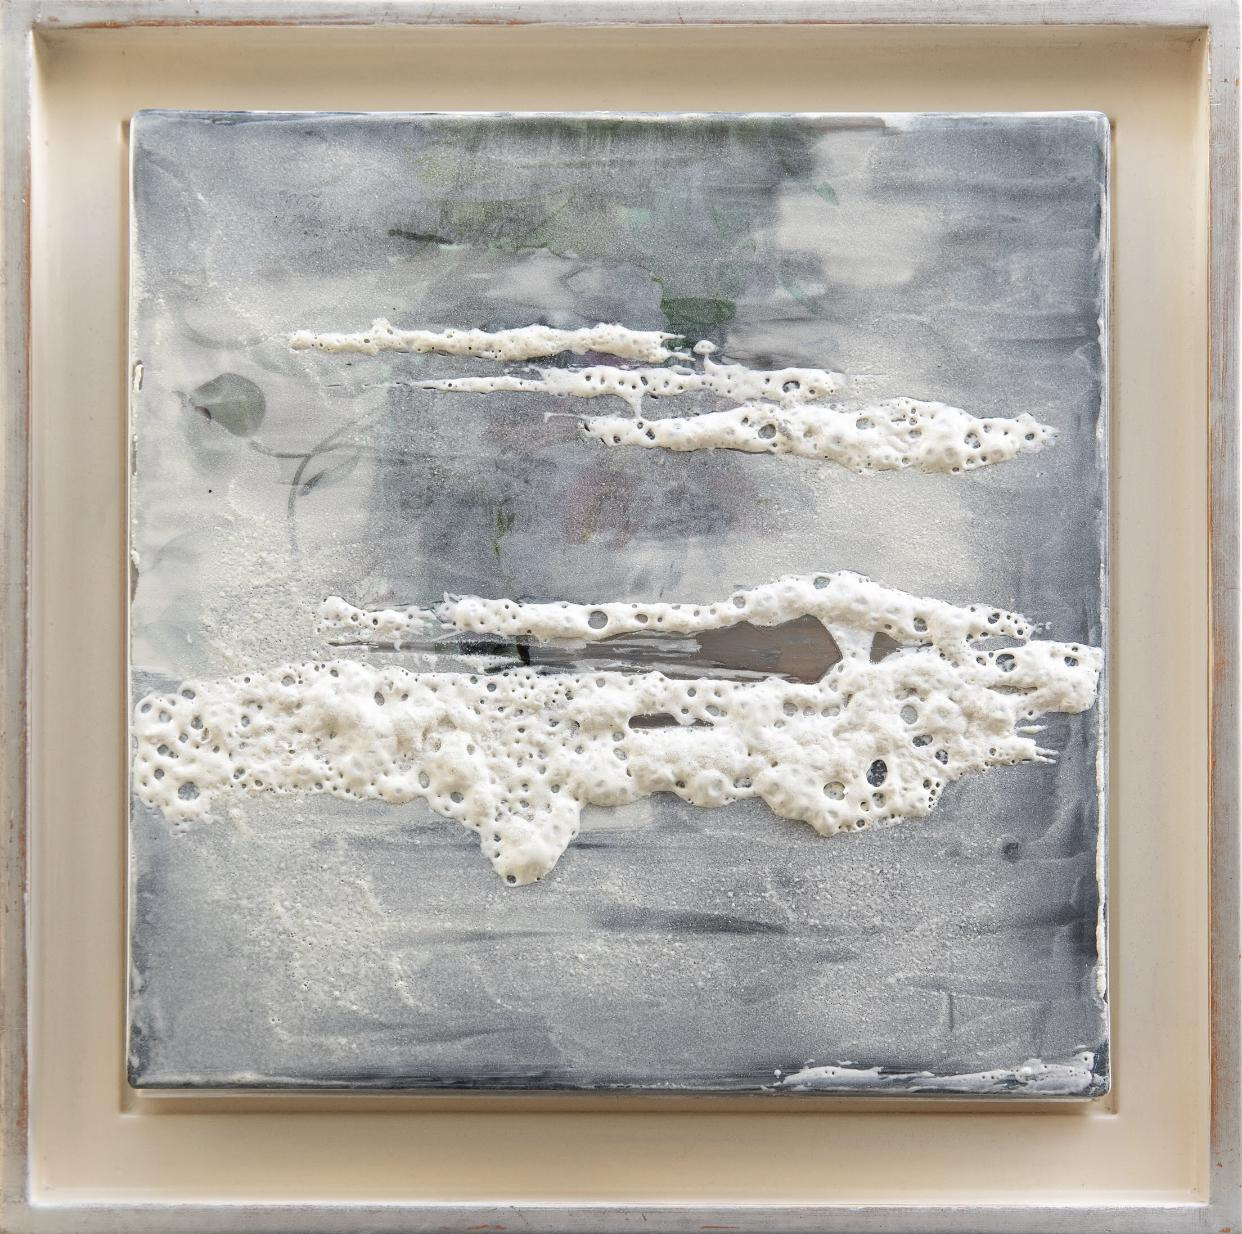 Massy Nasser Ghandi An interpretation of the Horizon Painted porcelain plate 33x33cm 2019